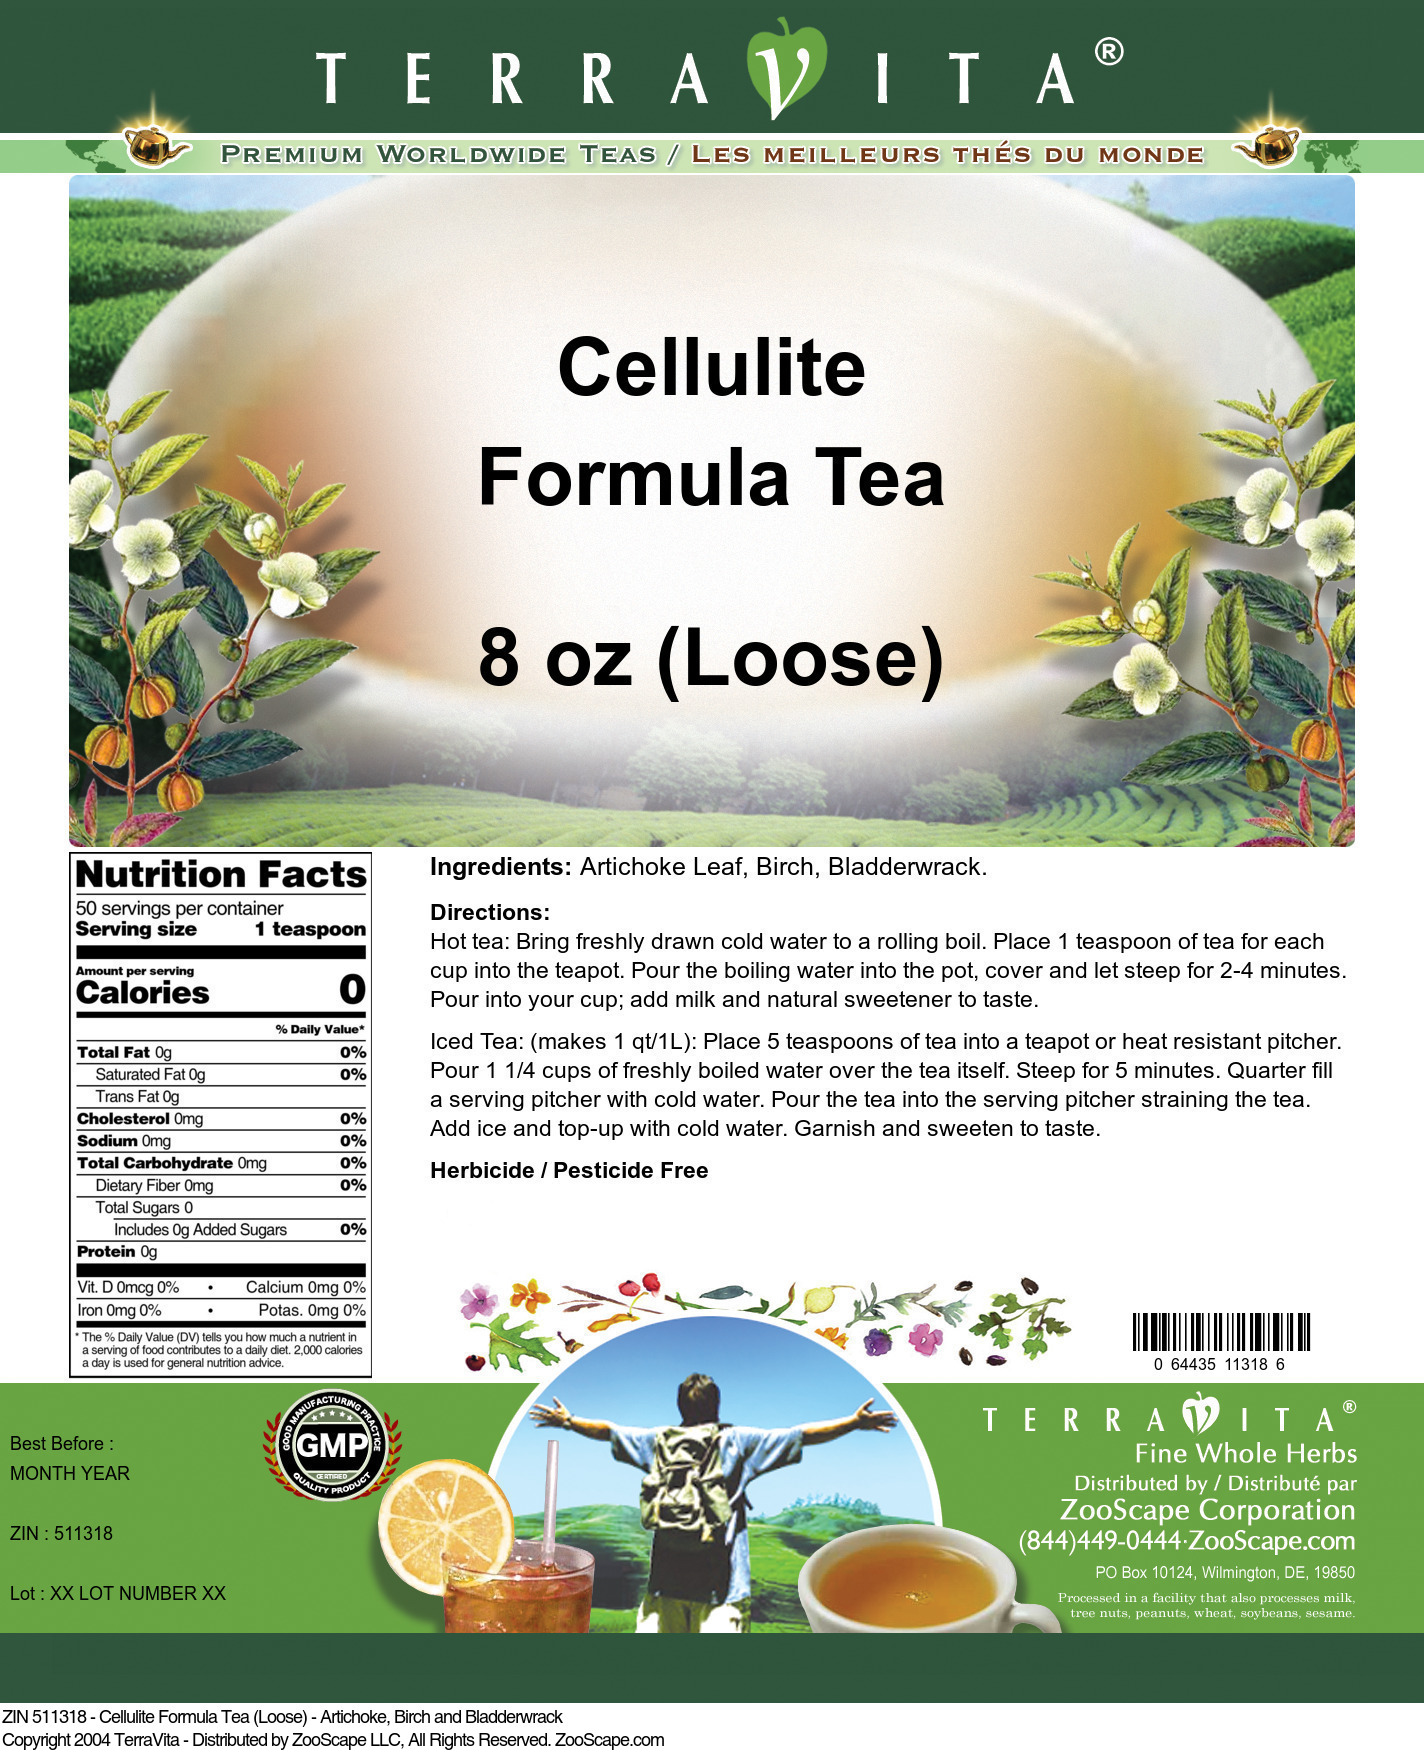 Cellulite Formula Tea (Loose) - Artichoke, Birch and Bladderwrack